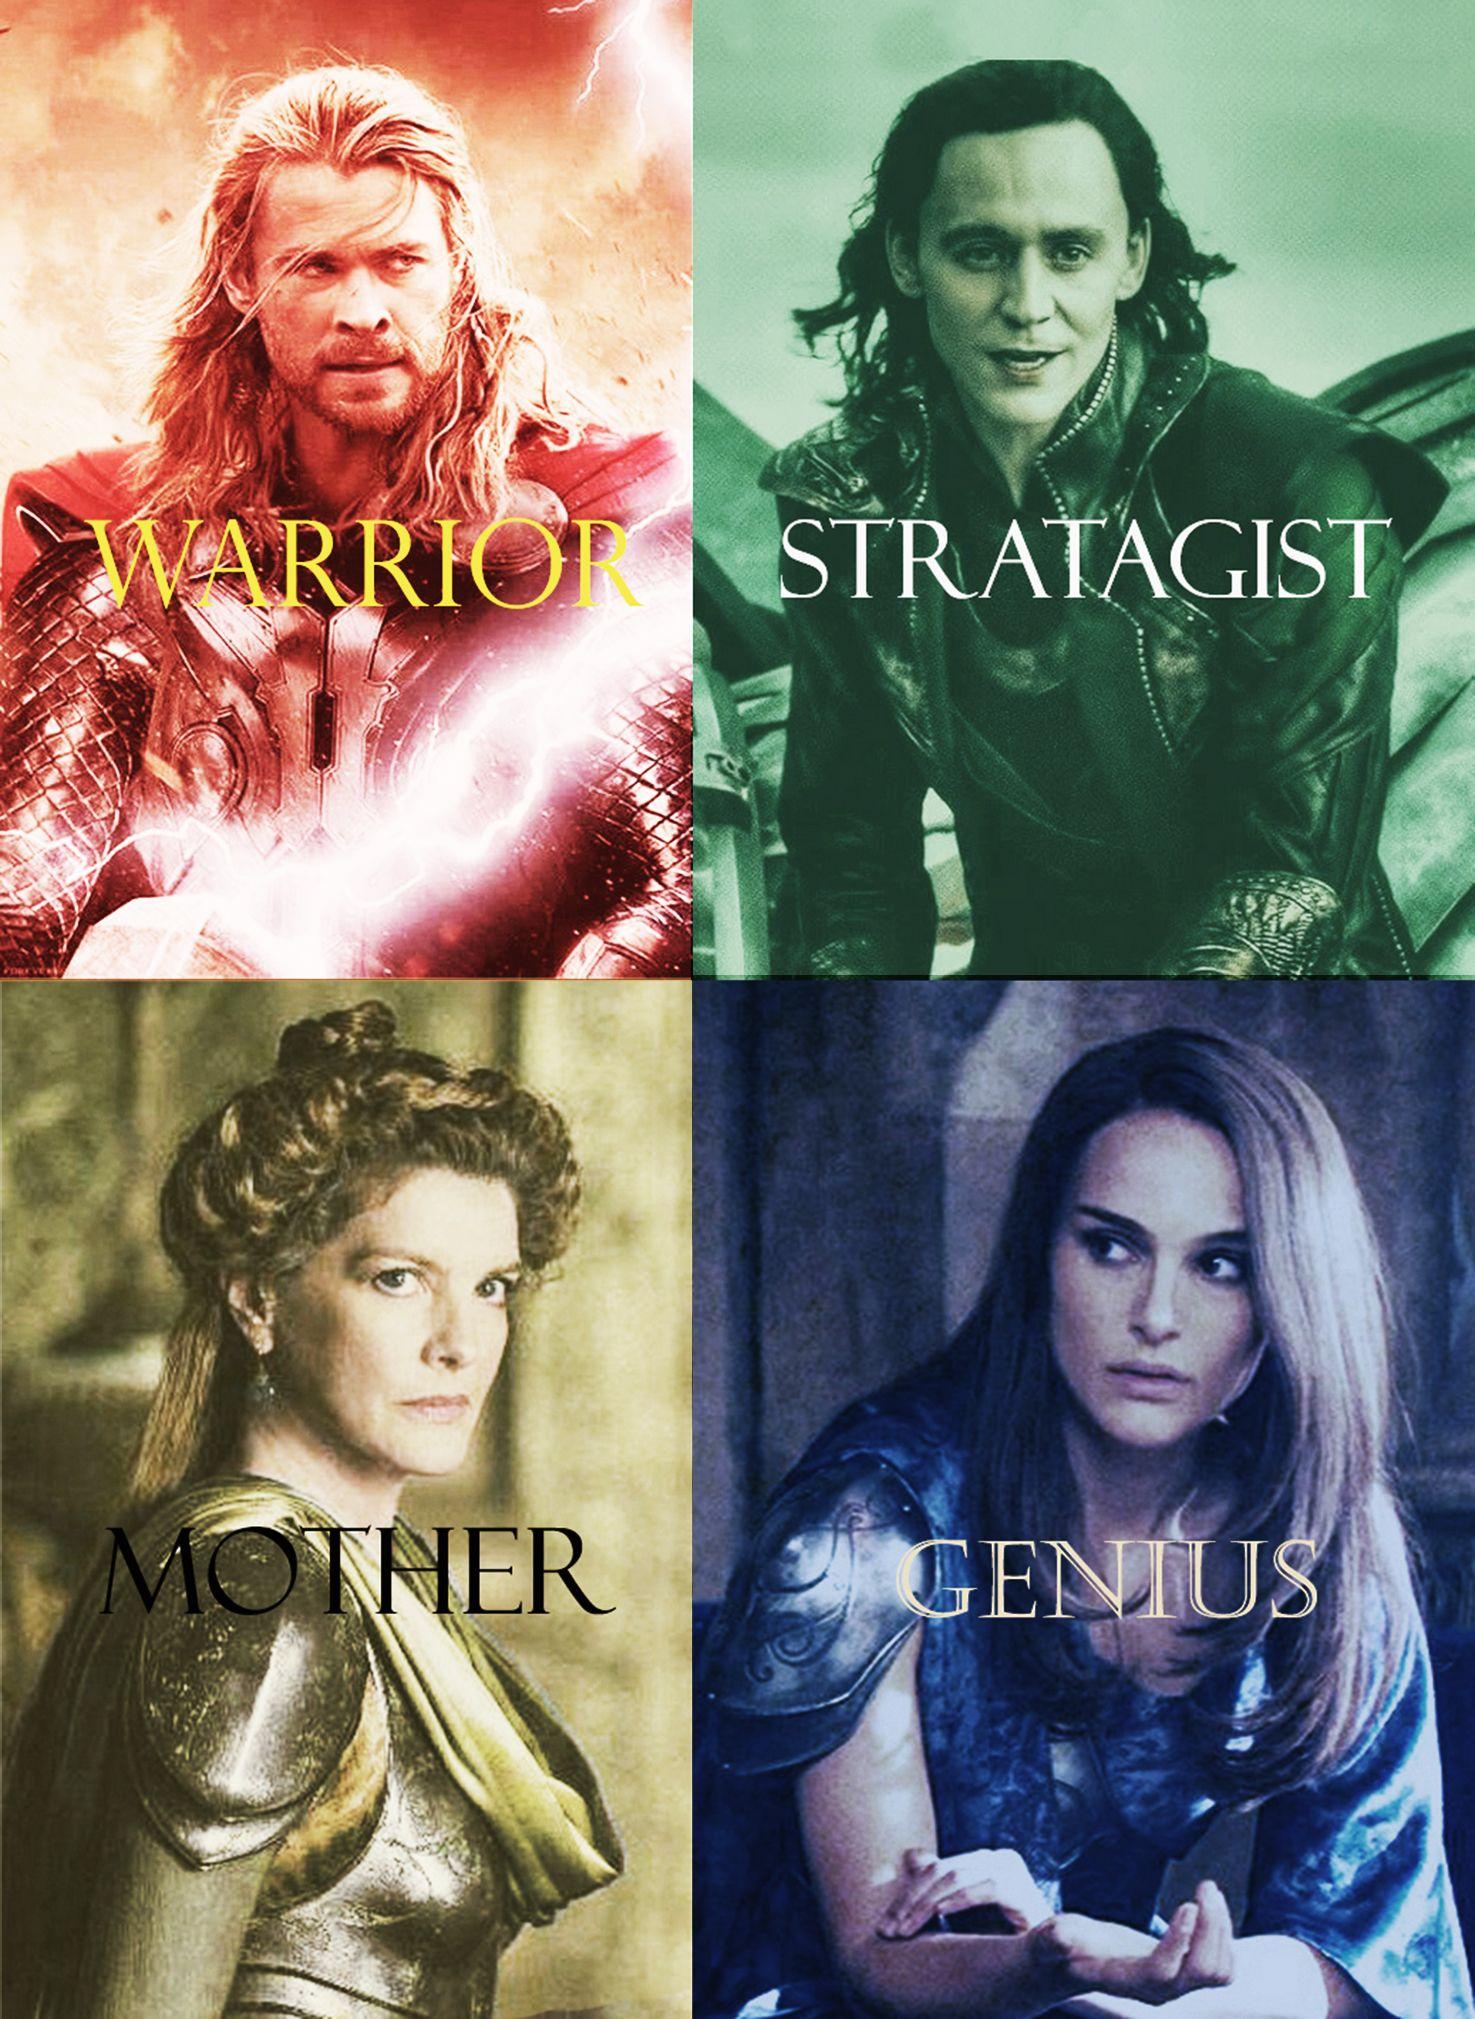 Marvel #Thor #HarryPotter #crossover   Thor as Gryffindor, Loki as